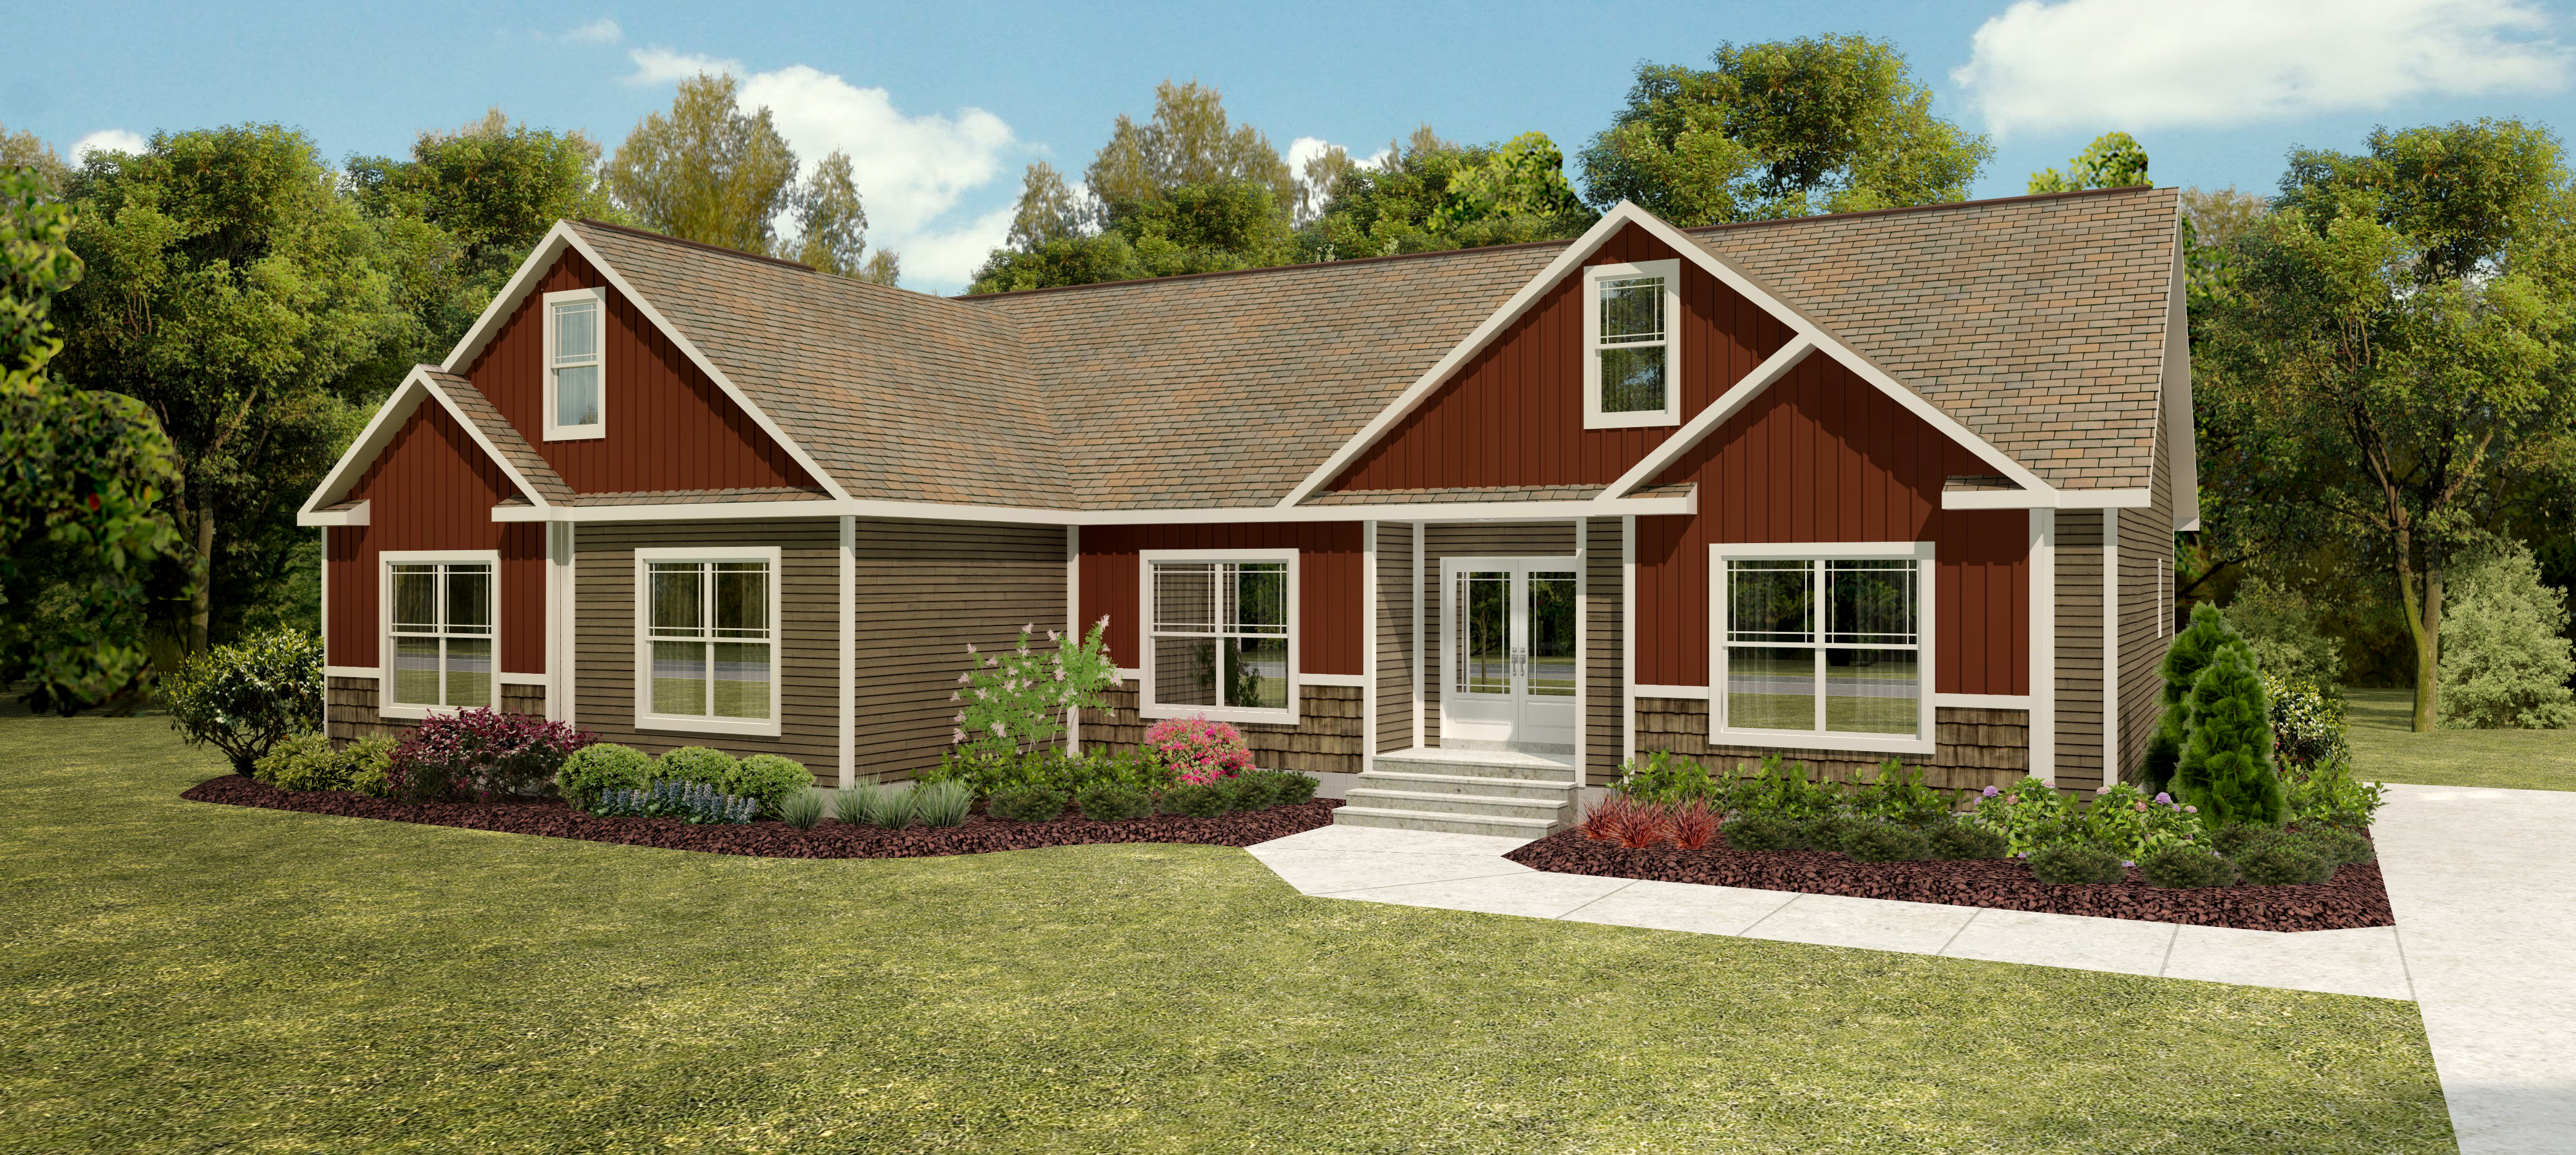 2350 Sq  Ft  Modular Home Floor Plan - Grandview Modular Home Style